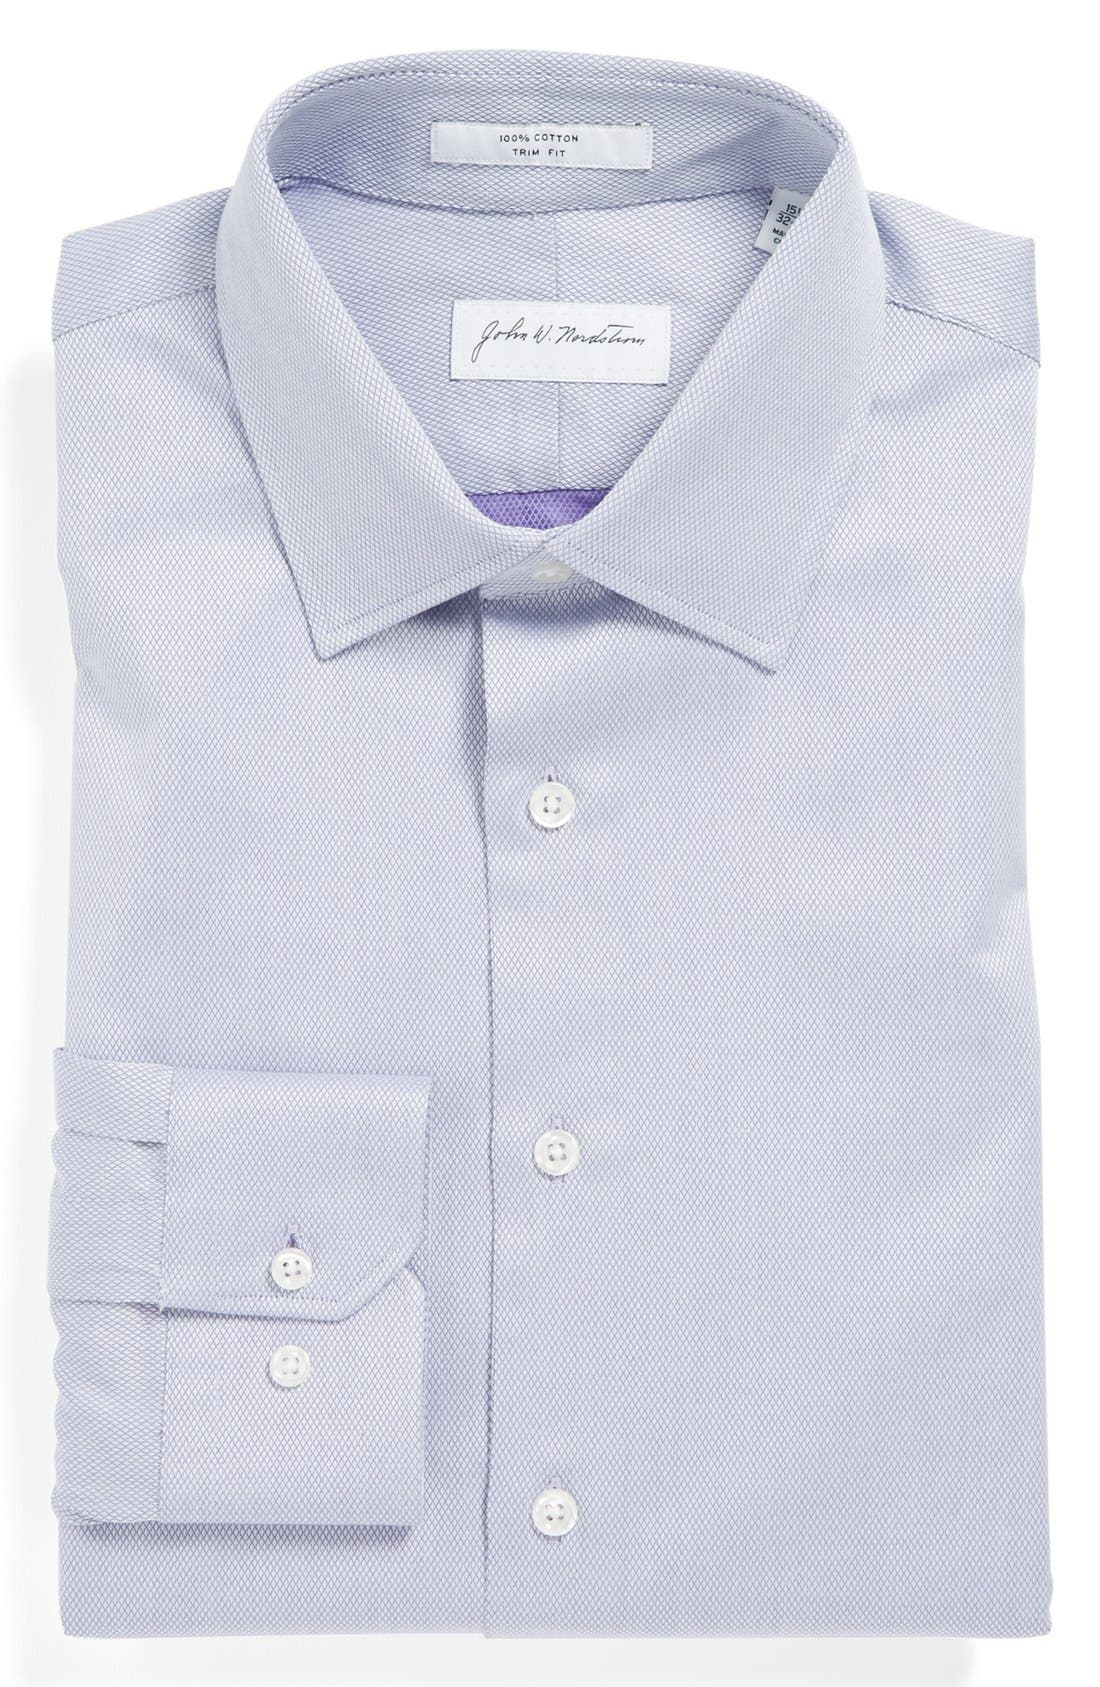 Alternate Image 1 Selected - John W. Nordstrom® Trim Fit Cotton Dress Shirt